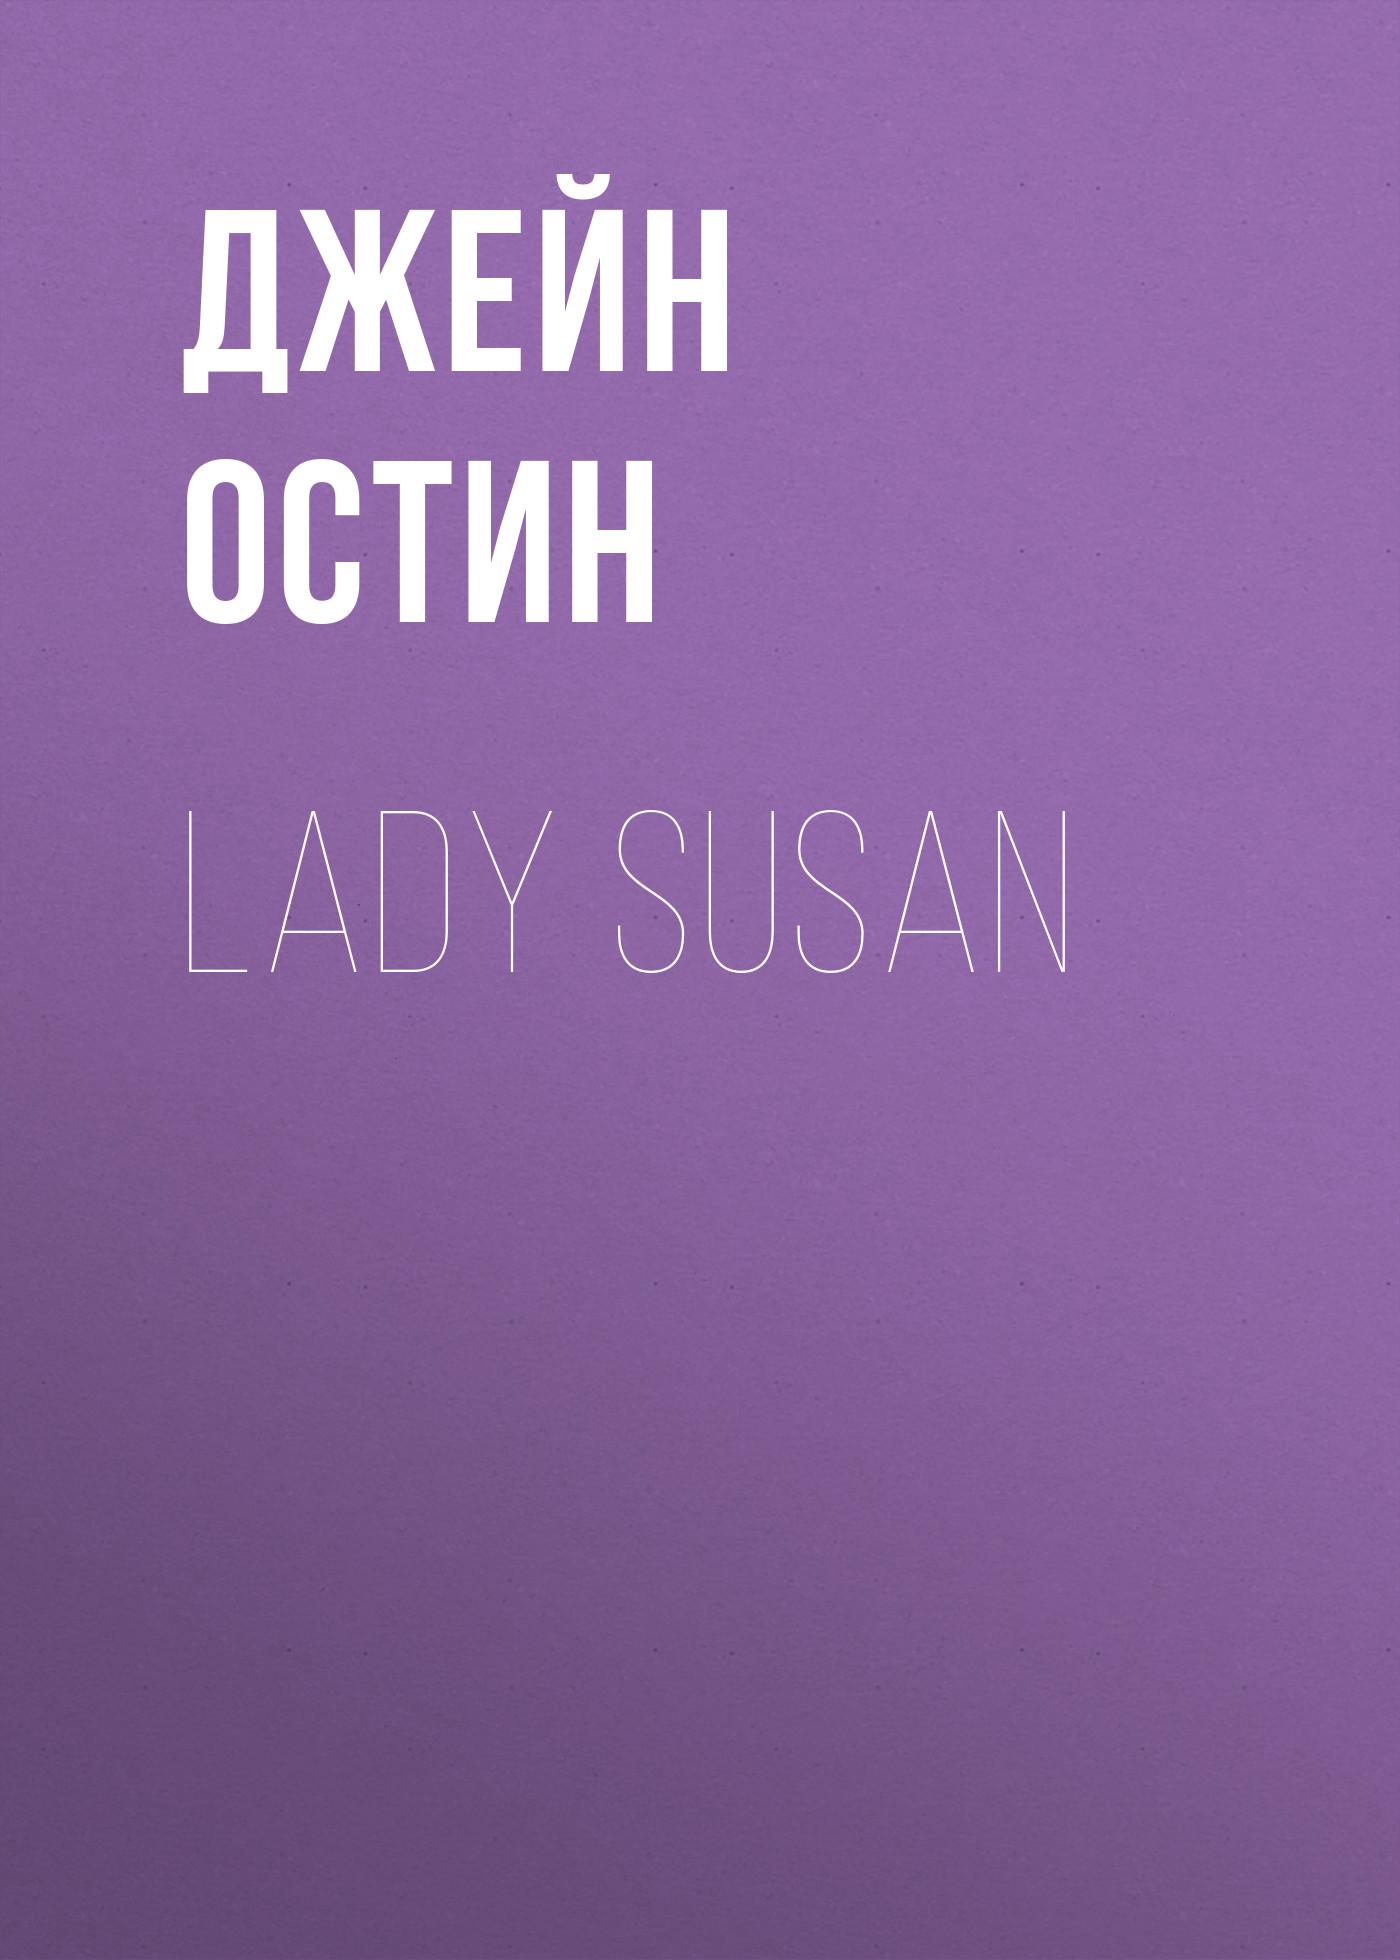 Джейн Остин Lady Susan